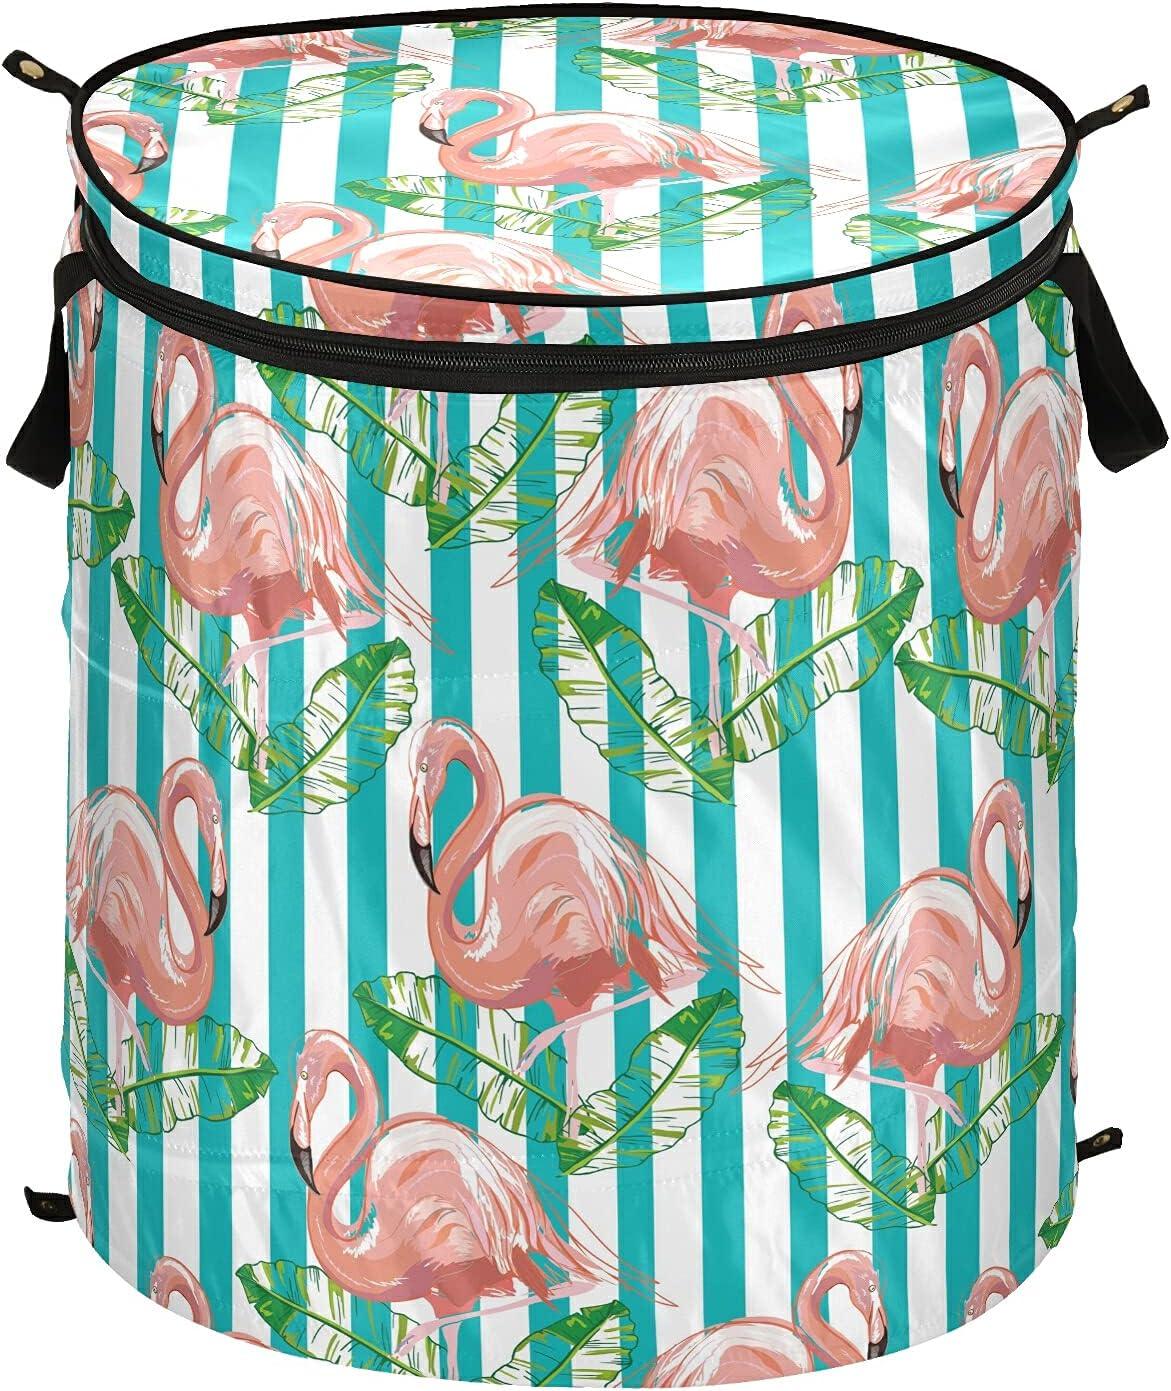 Flamingo Pink Pop-Up Laundry Hamper Regular discount Zipper New York Mall Collapsi with Handles